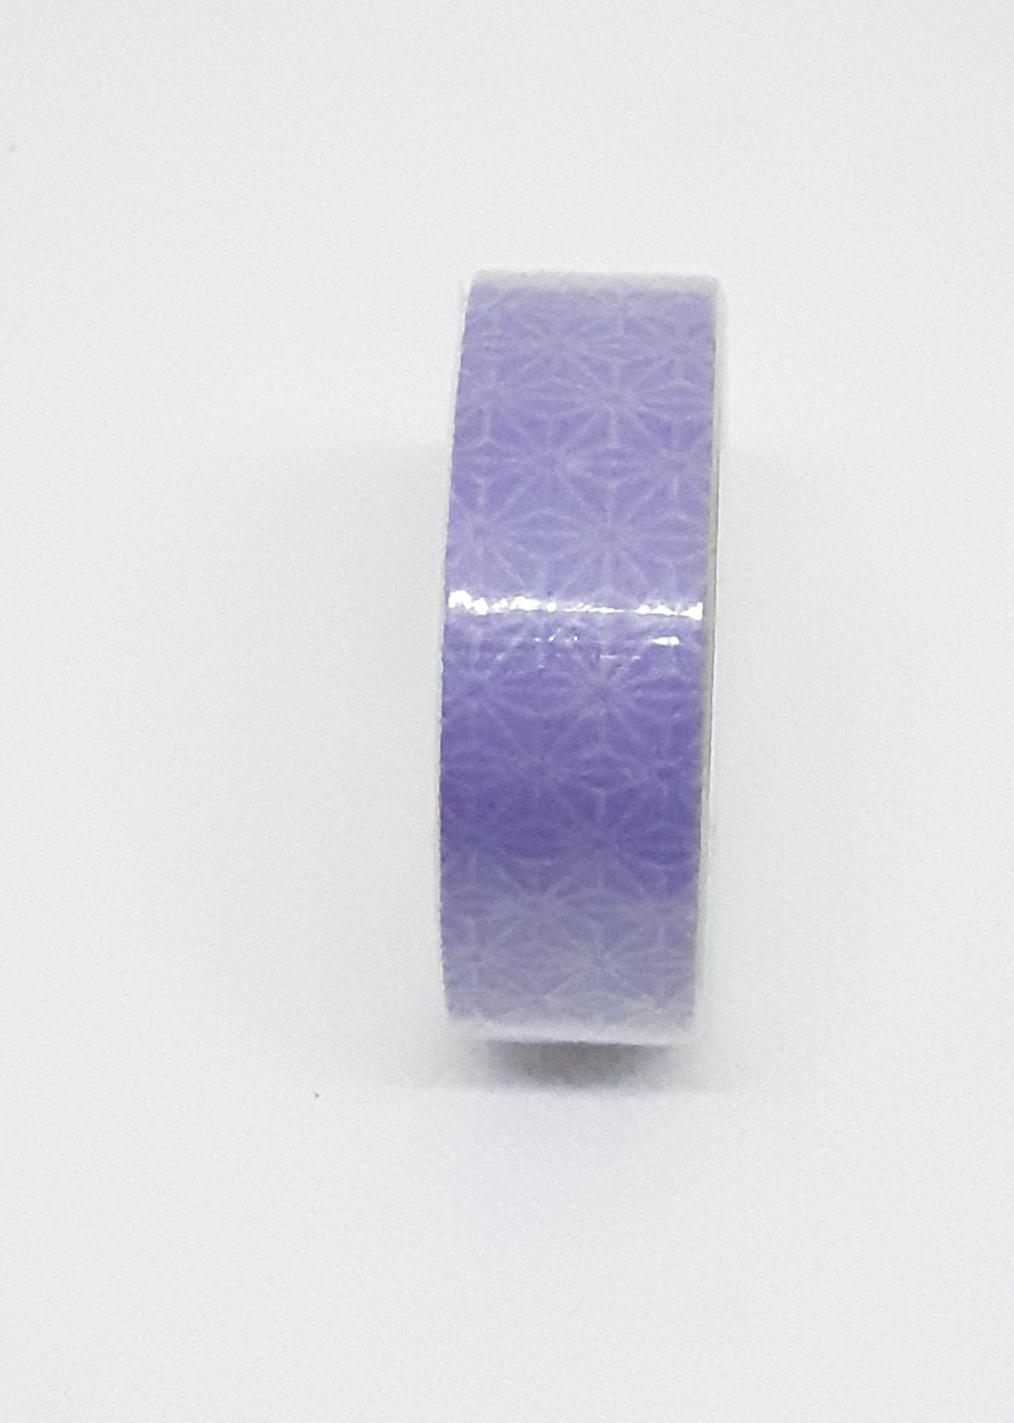 Adhésif de masquage en papier de riz - Motif lilas